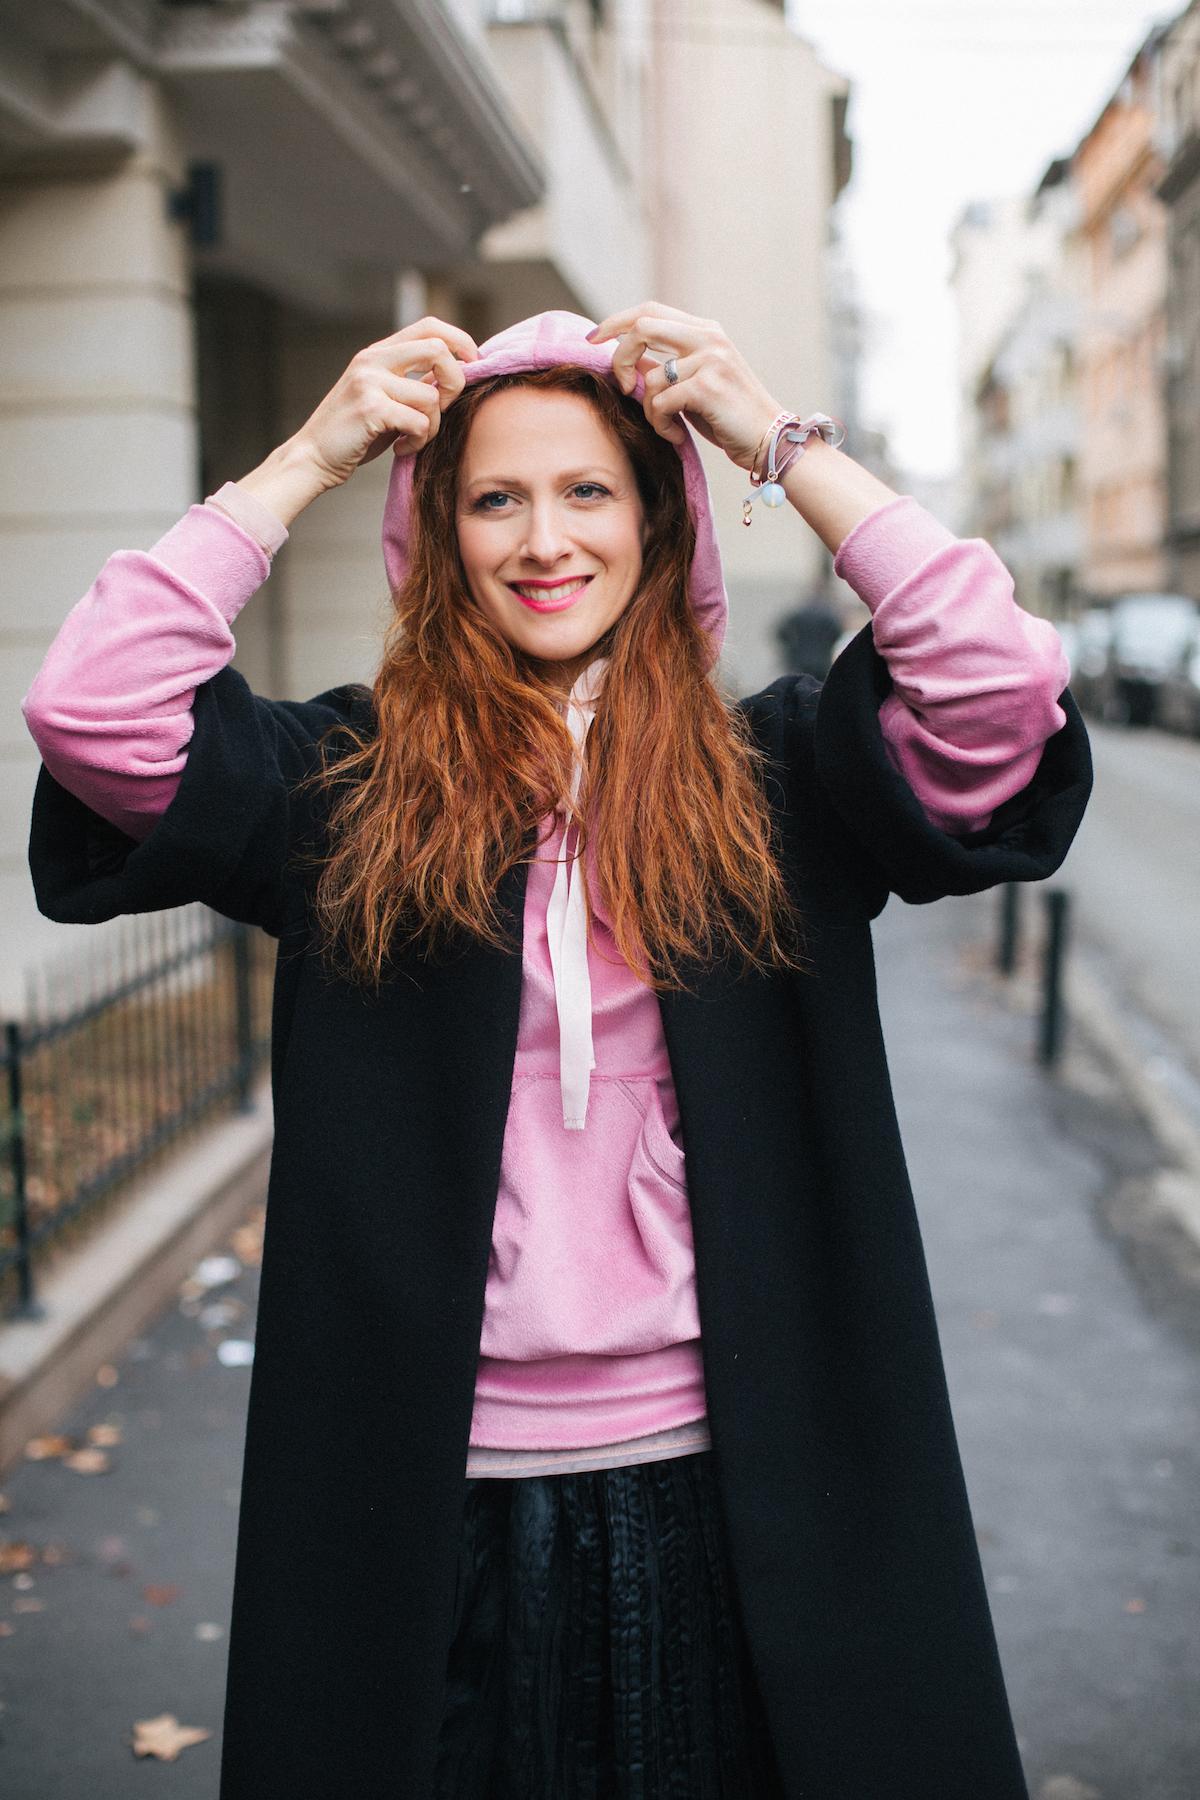 Beograd slovenska moda Nika Veger Beutyfullblog roza pulover maja stamol foto Jovana Tomasevic